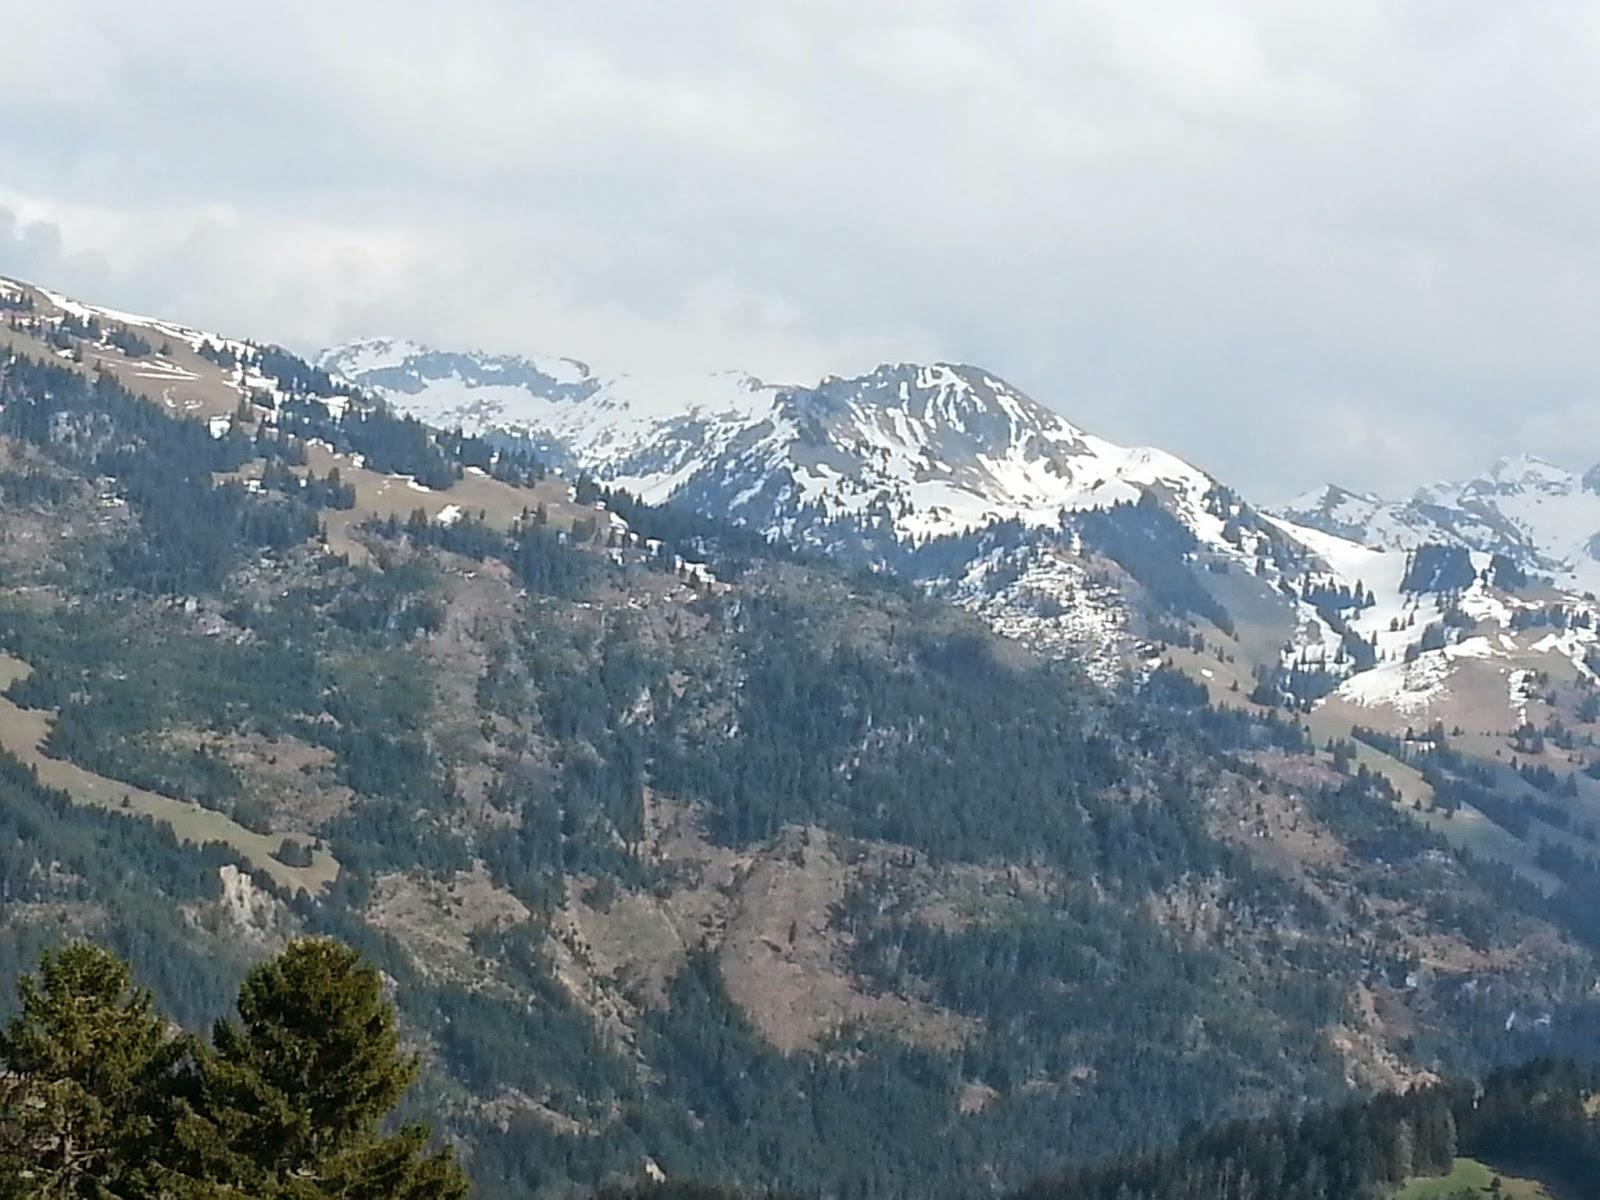 Meus vizinhos na Suíça.